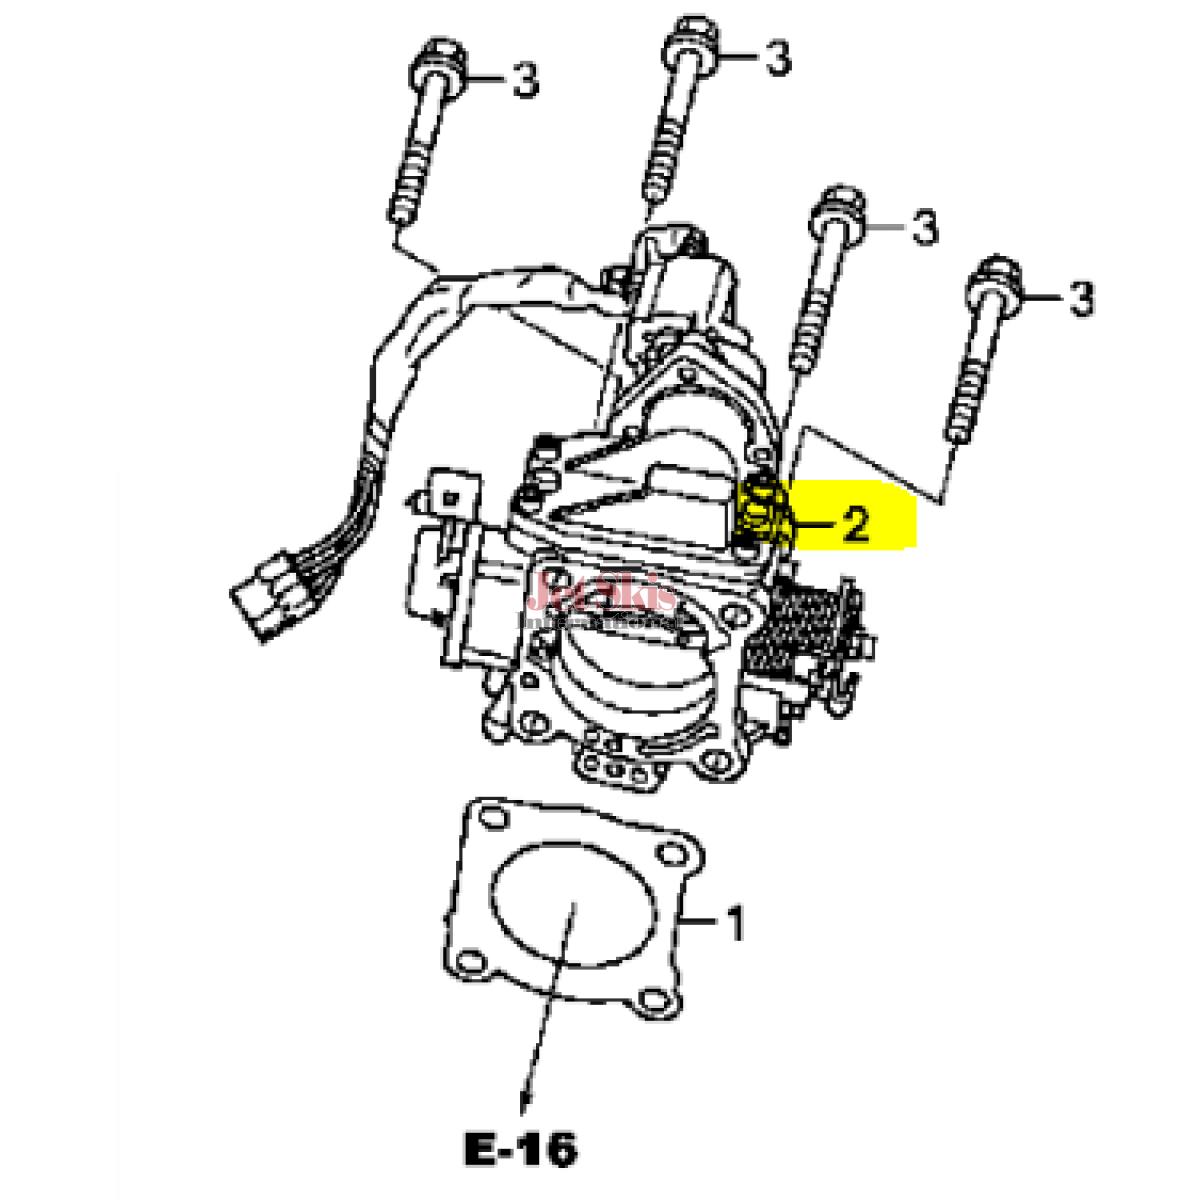 Honda Aquatrax Hw5 901 Throttle Body Assembly